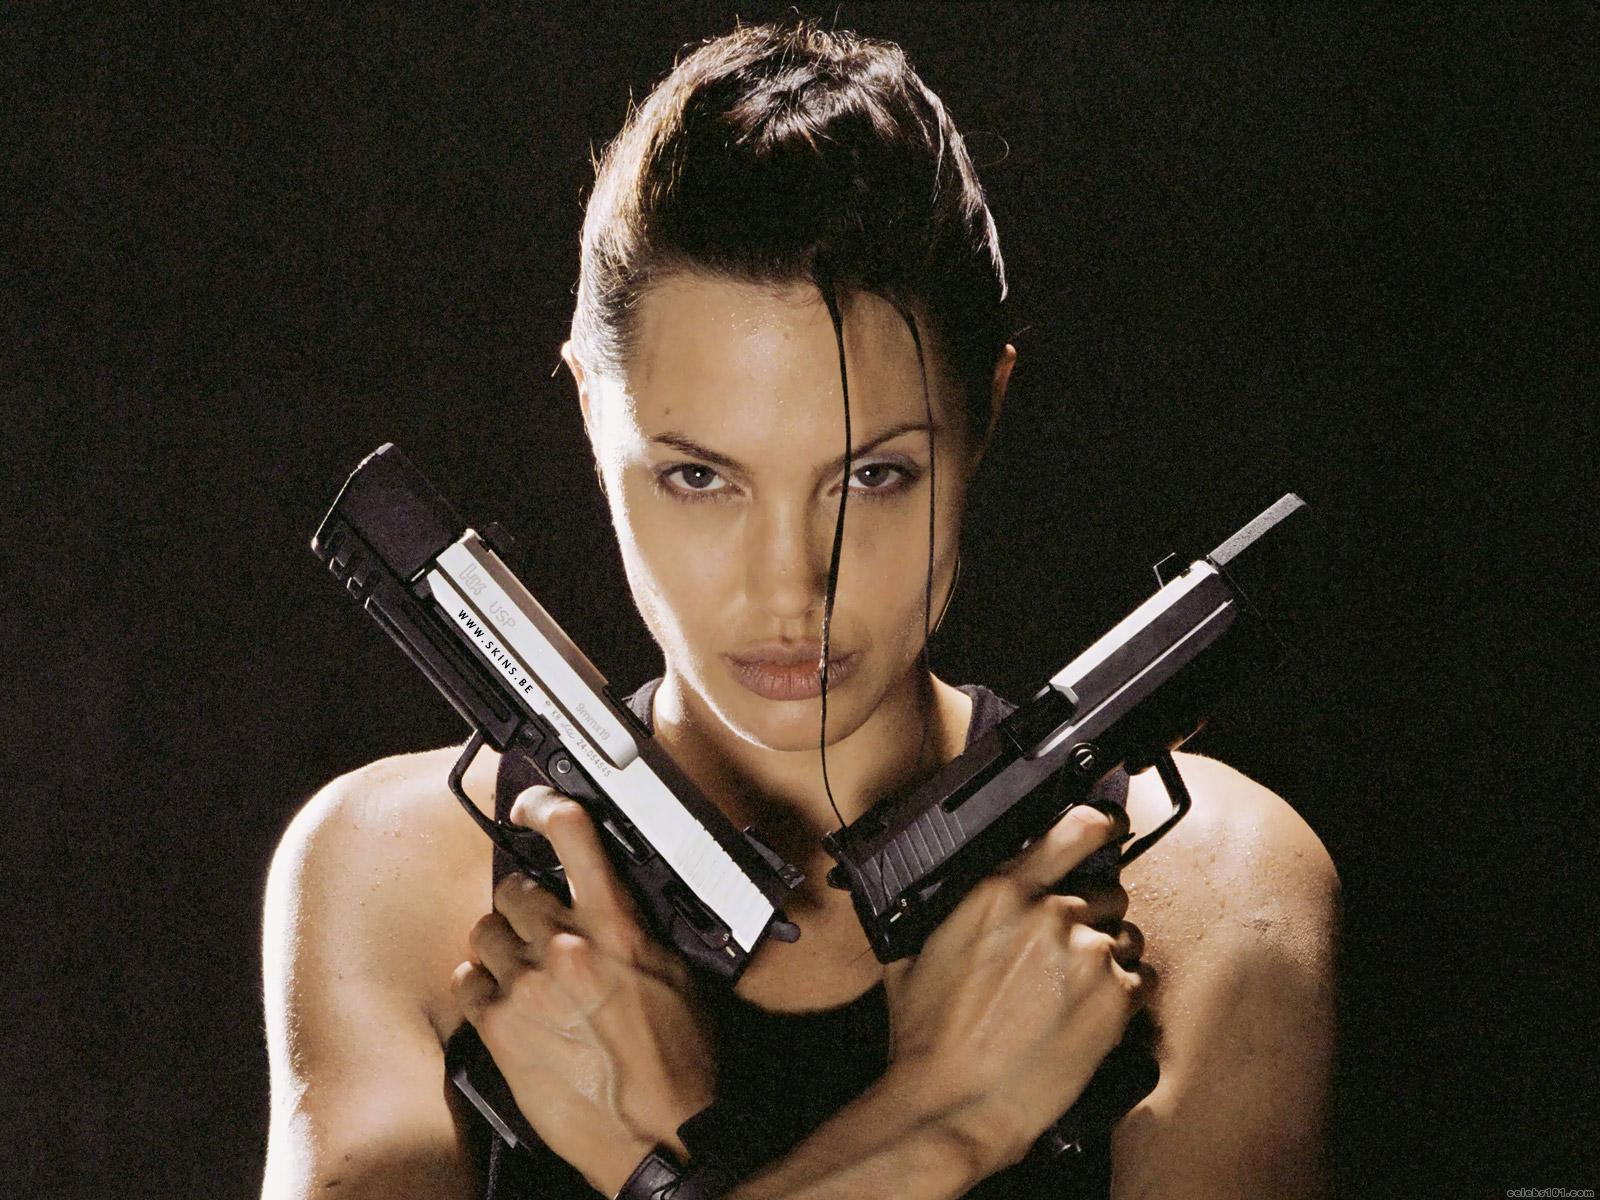 http://3.bp.blogspot.com/-kdhZhQdWOyE/T5lWyNzqx6I/AAAAAAAAABg/GyaU9g-Jadk/s1600/Angelina+Jolie+wallpapers+9.jpg